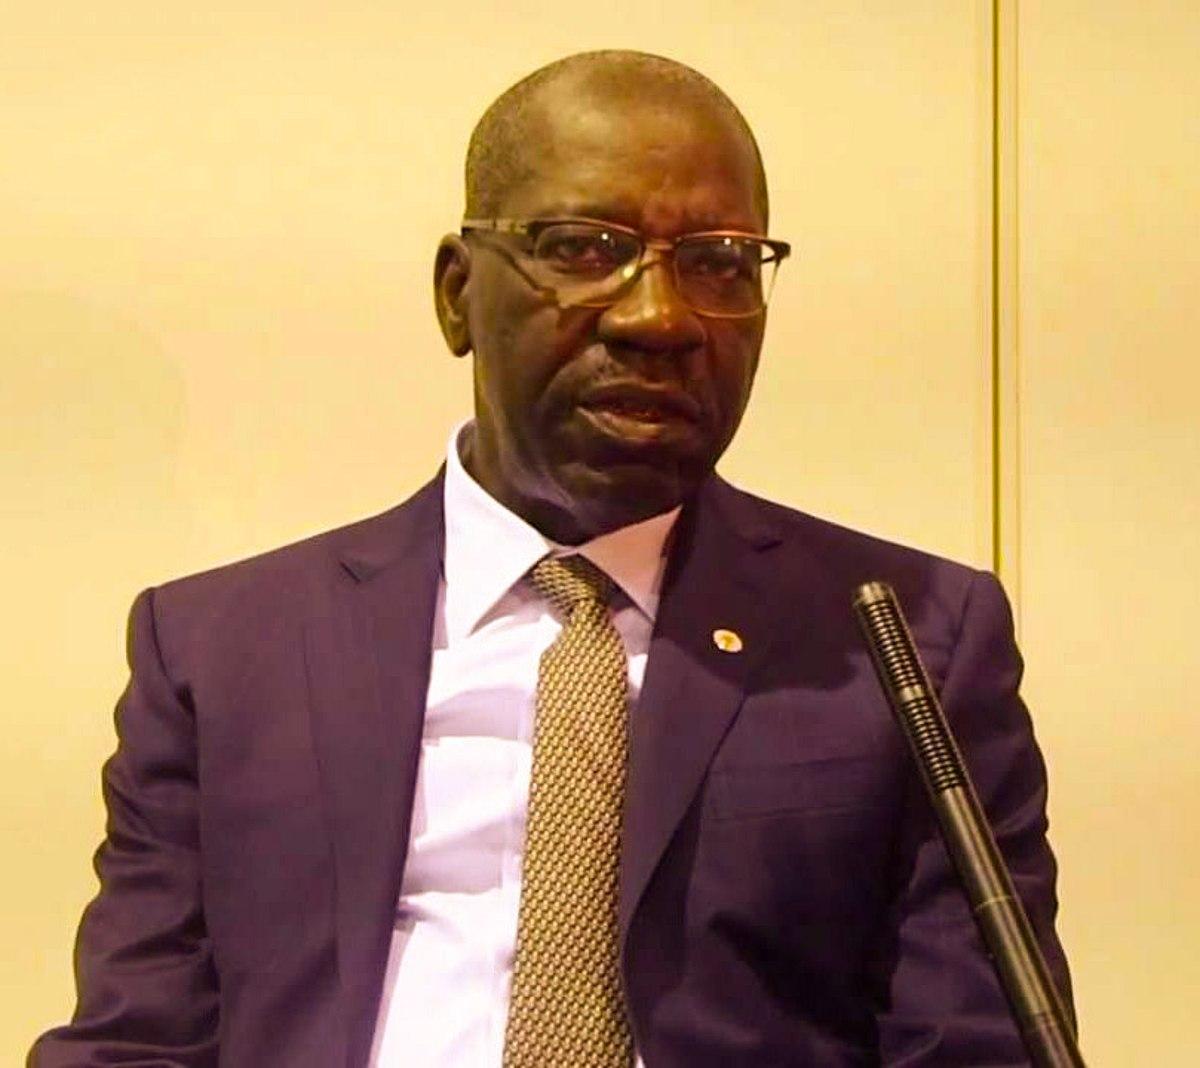 Edo State Governor commends BBNaija's Liquorose over comportment on show